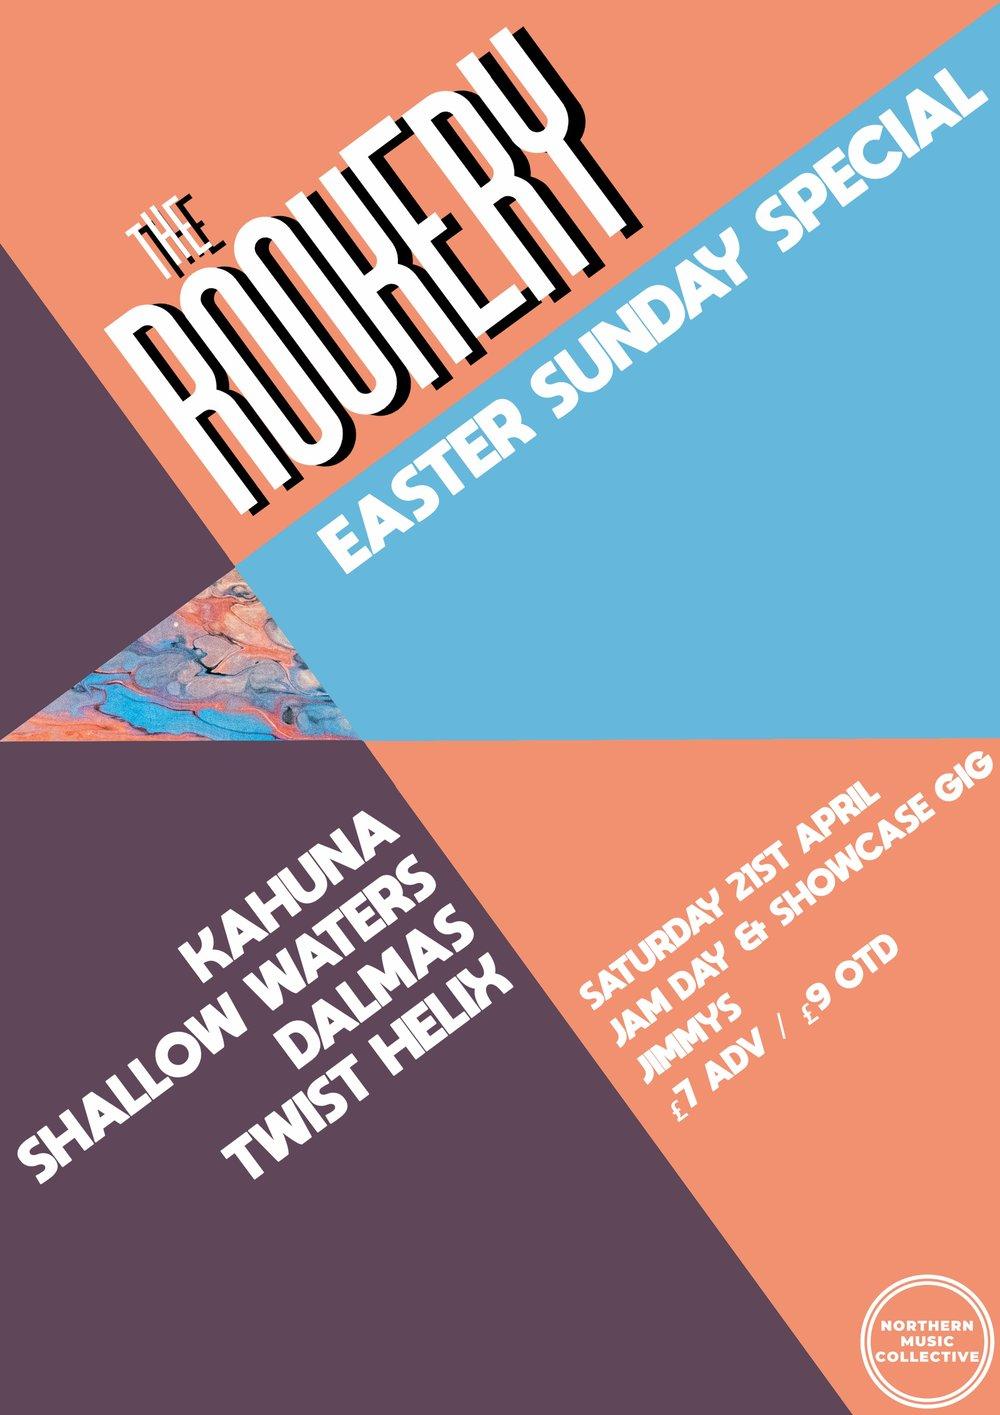 Easter Sunday 21:04:19 poster 2 A4.jpg